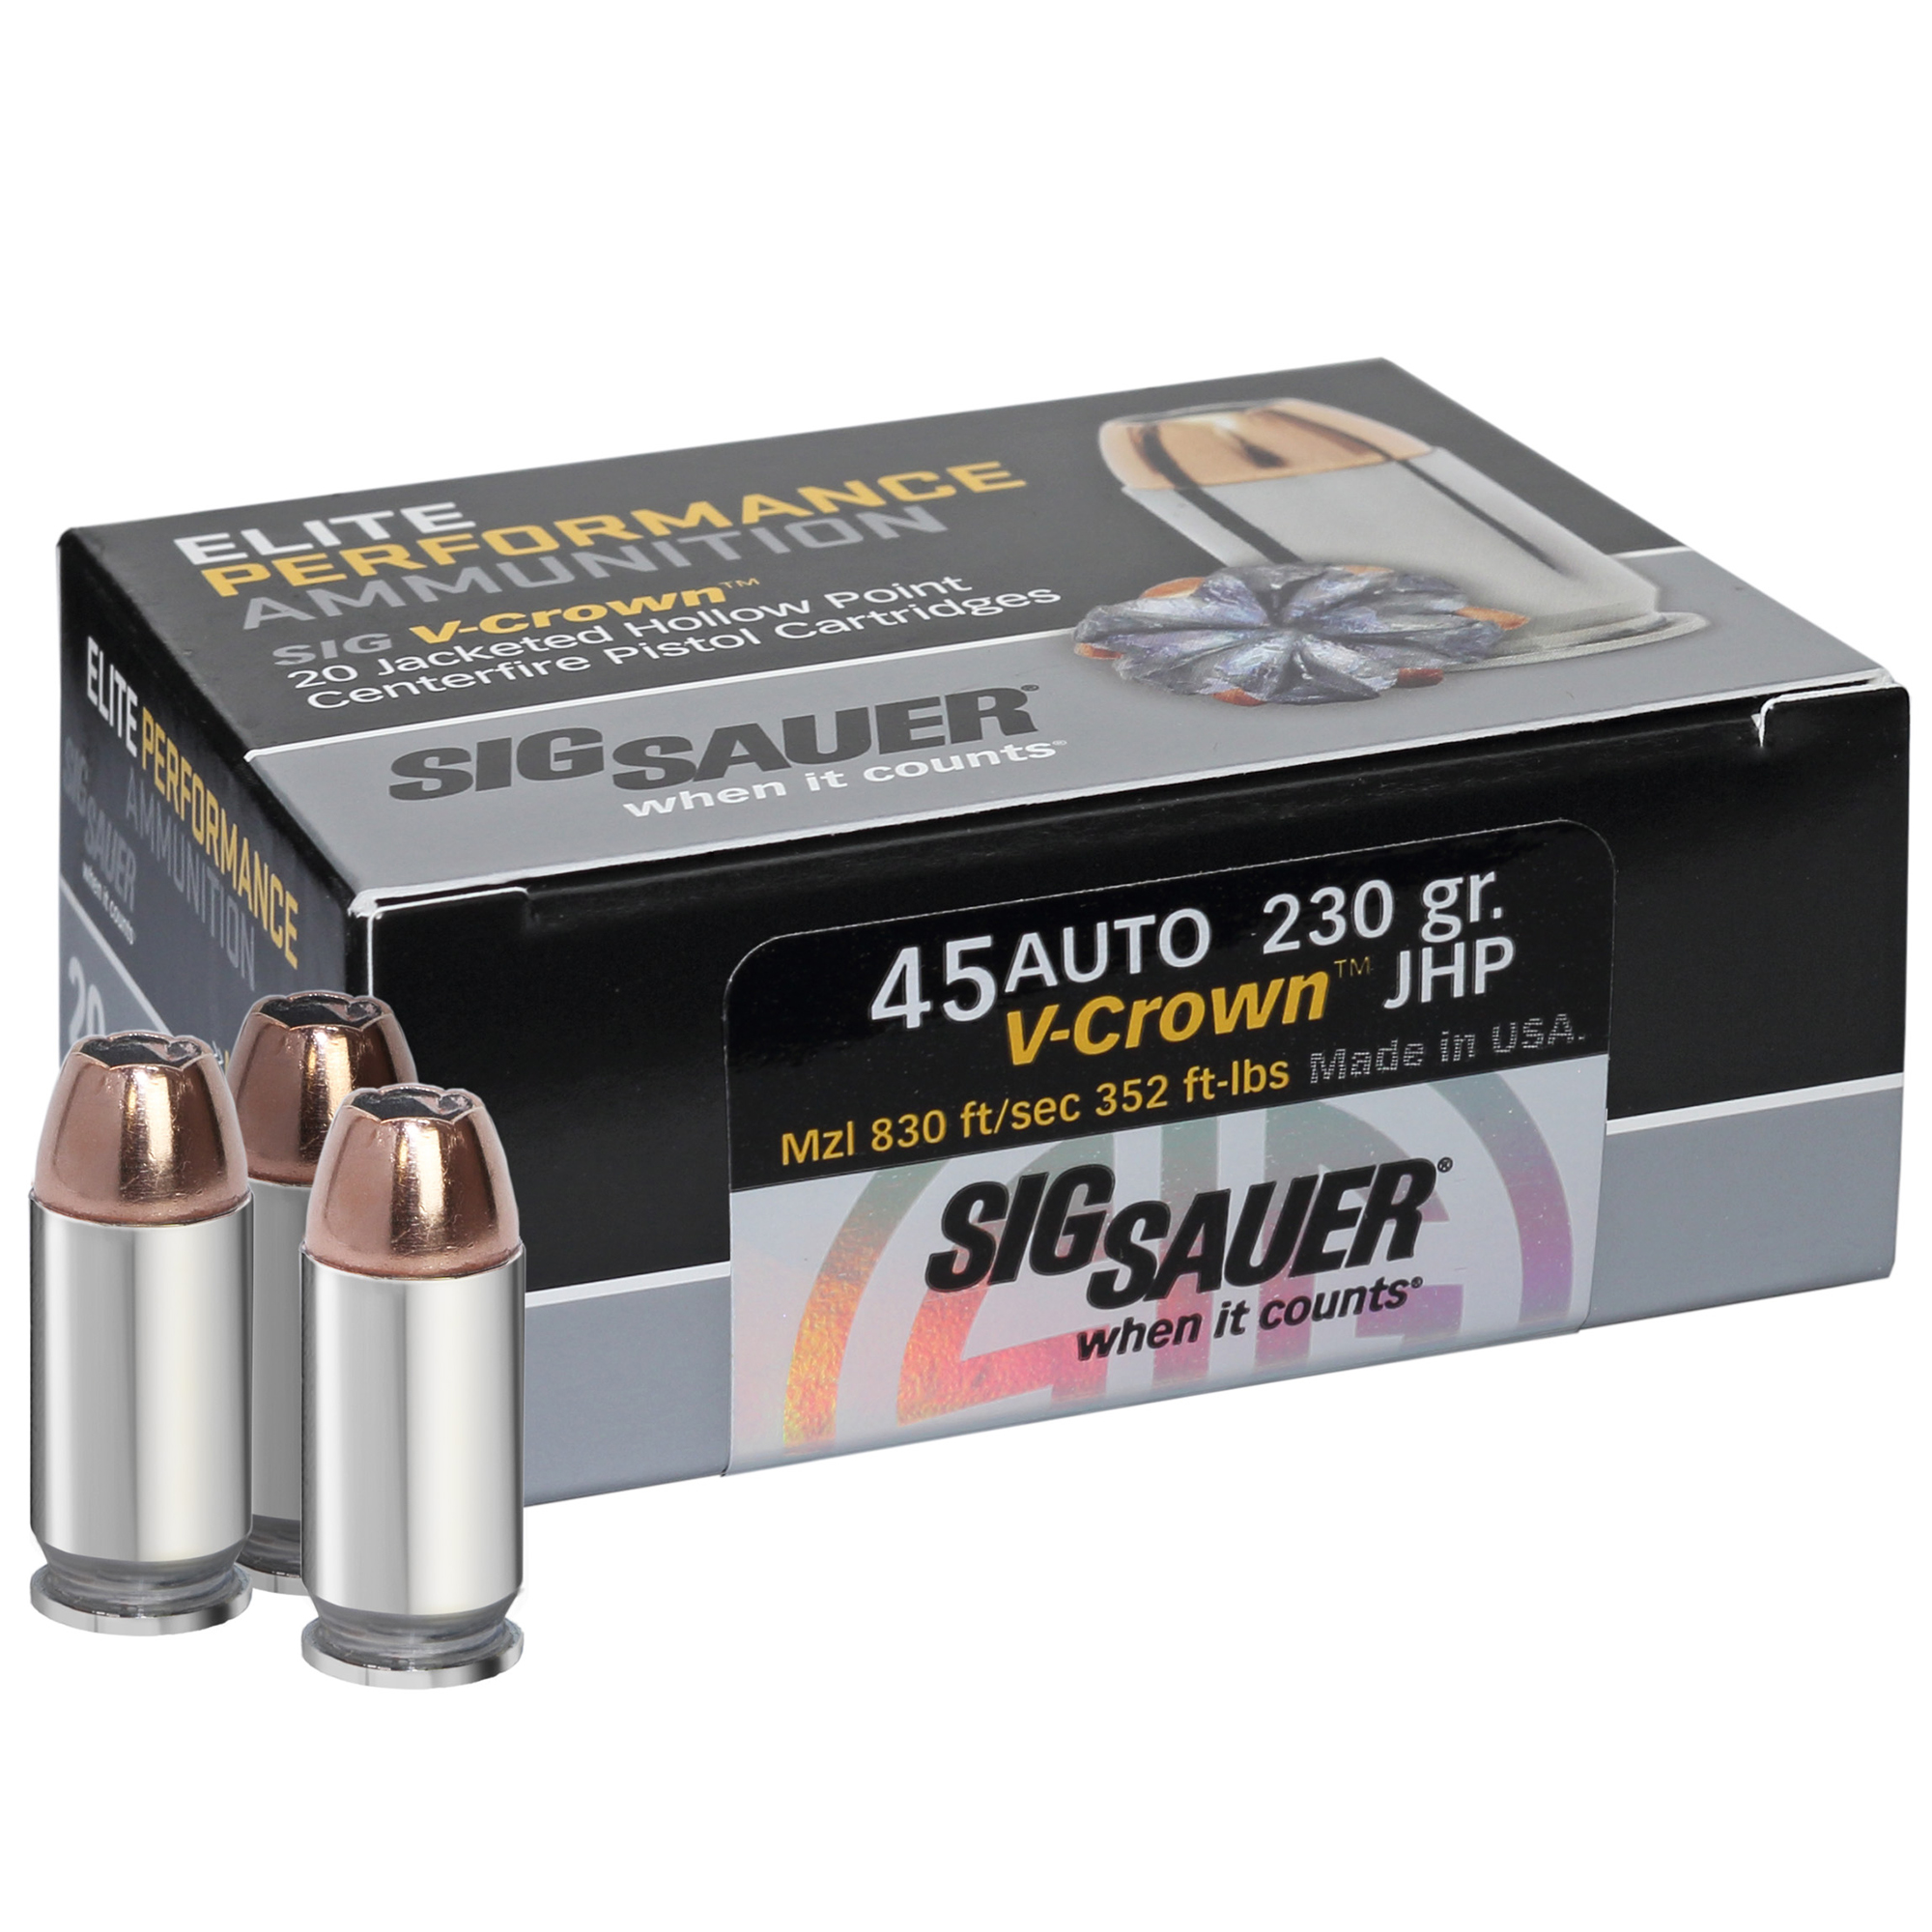 SIG Sauer Elite Performance V-Crown Ammo, .45 ACP, 230-gr, JHP